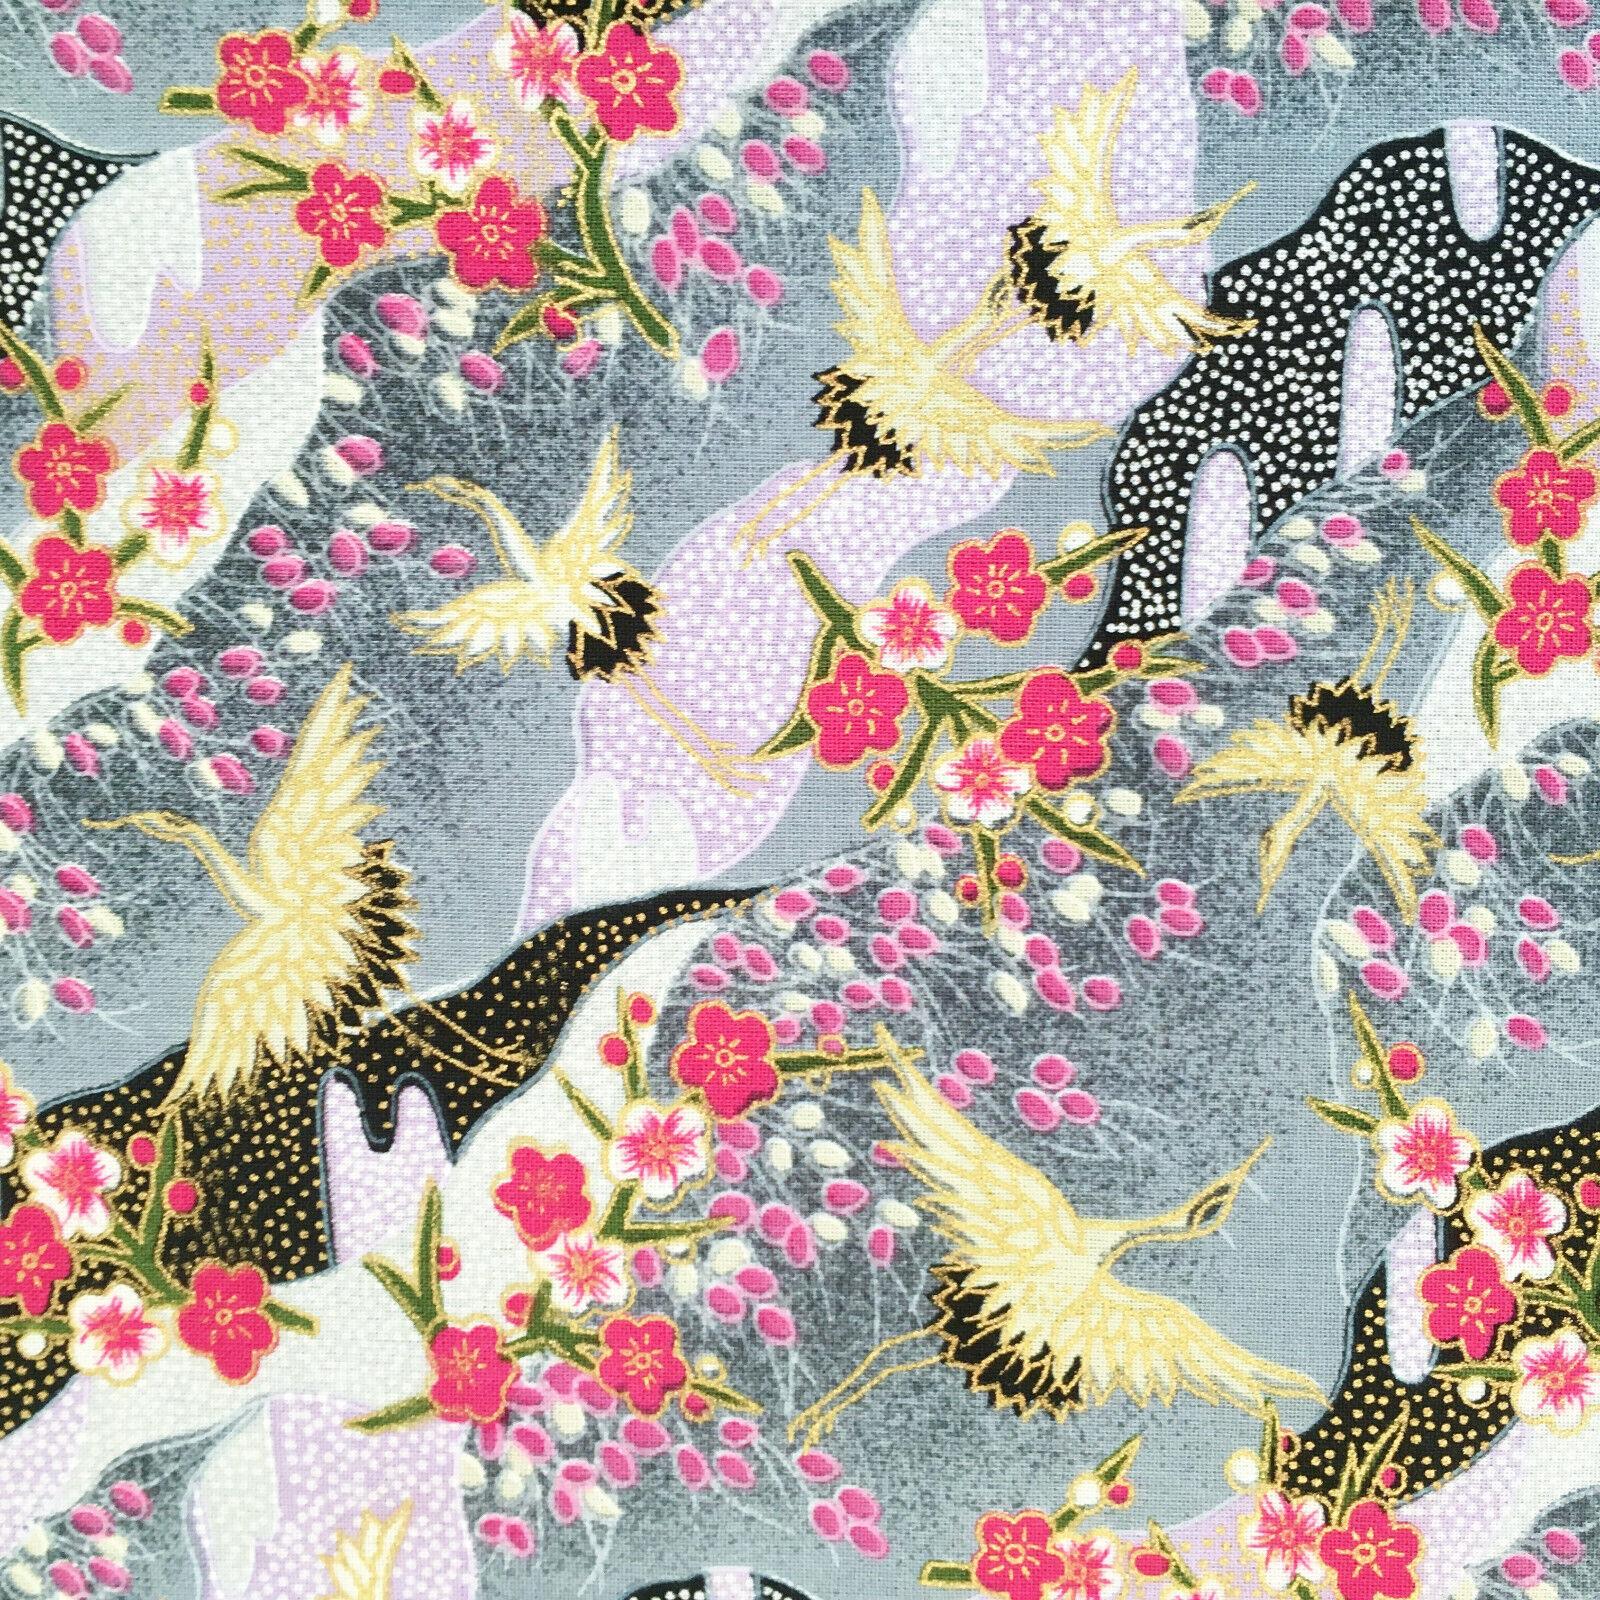 metallic bird floral oriental stork Japanese cranes fabric black silver pink